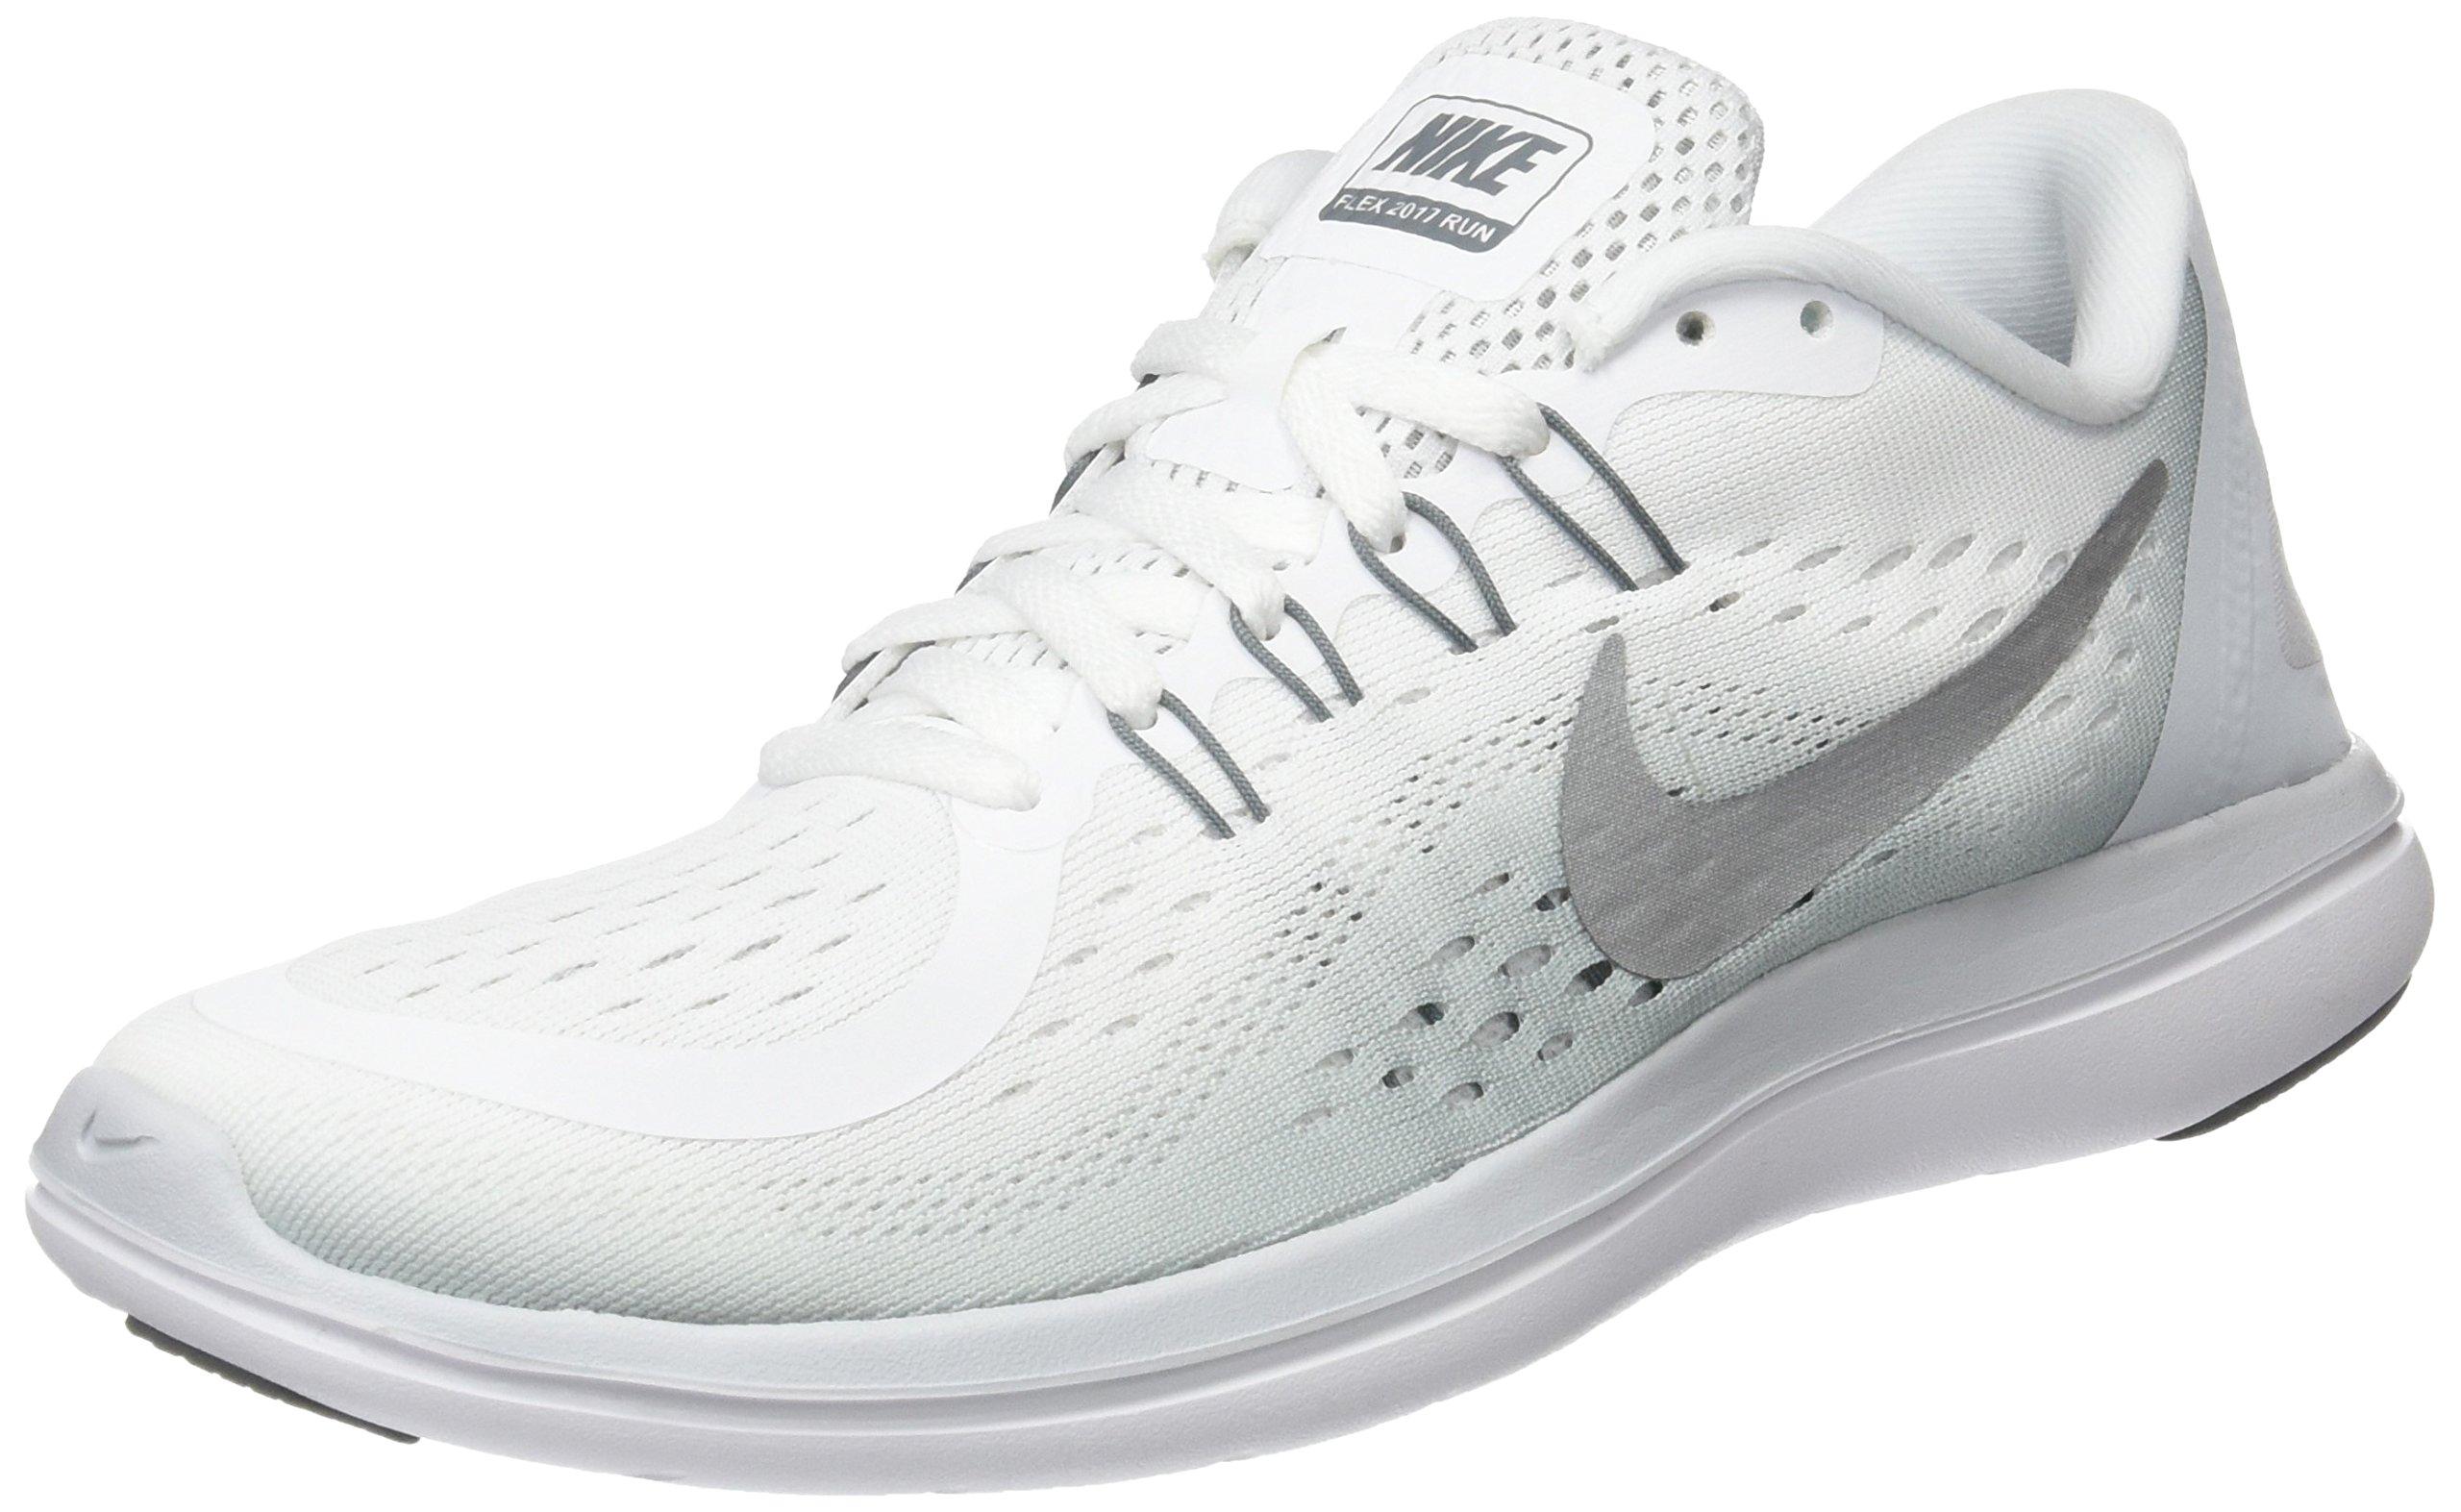 NIKE Women's Flex 2017 RN Running Shoe (7 B(M) US, White/Metallic/Silver)